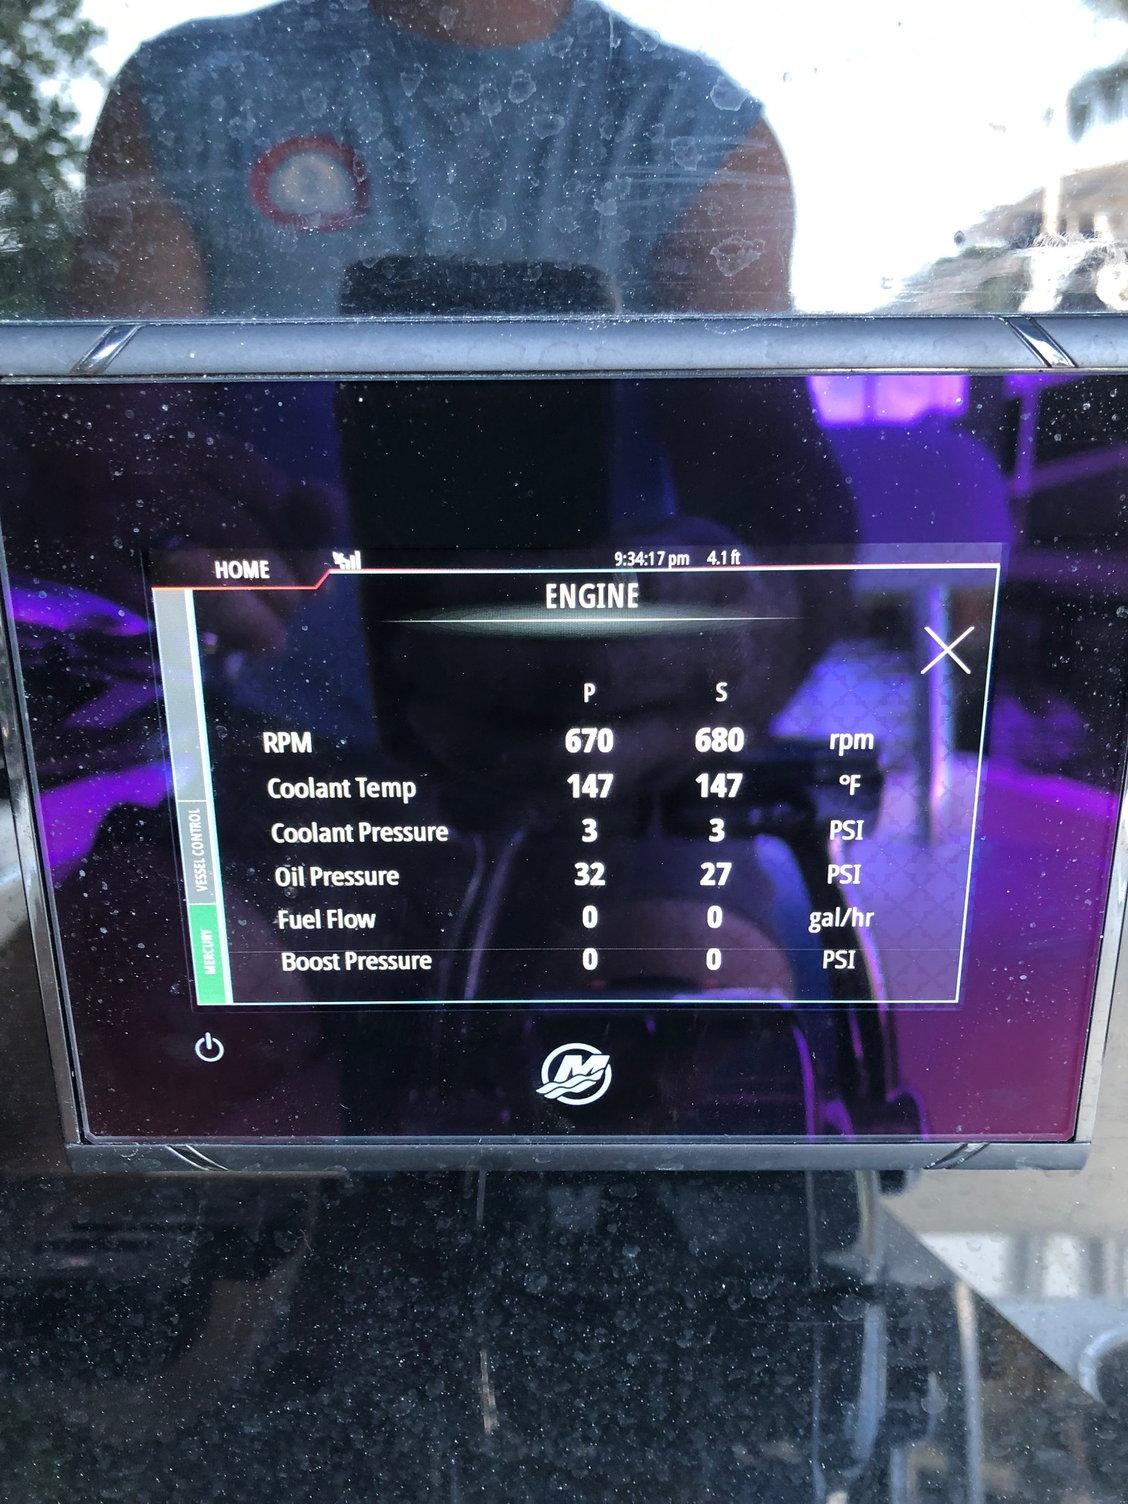 Verado oil pressure/engine numbers - The Hull Truth